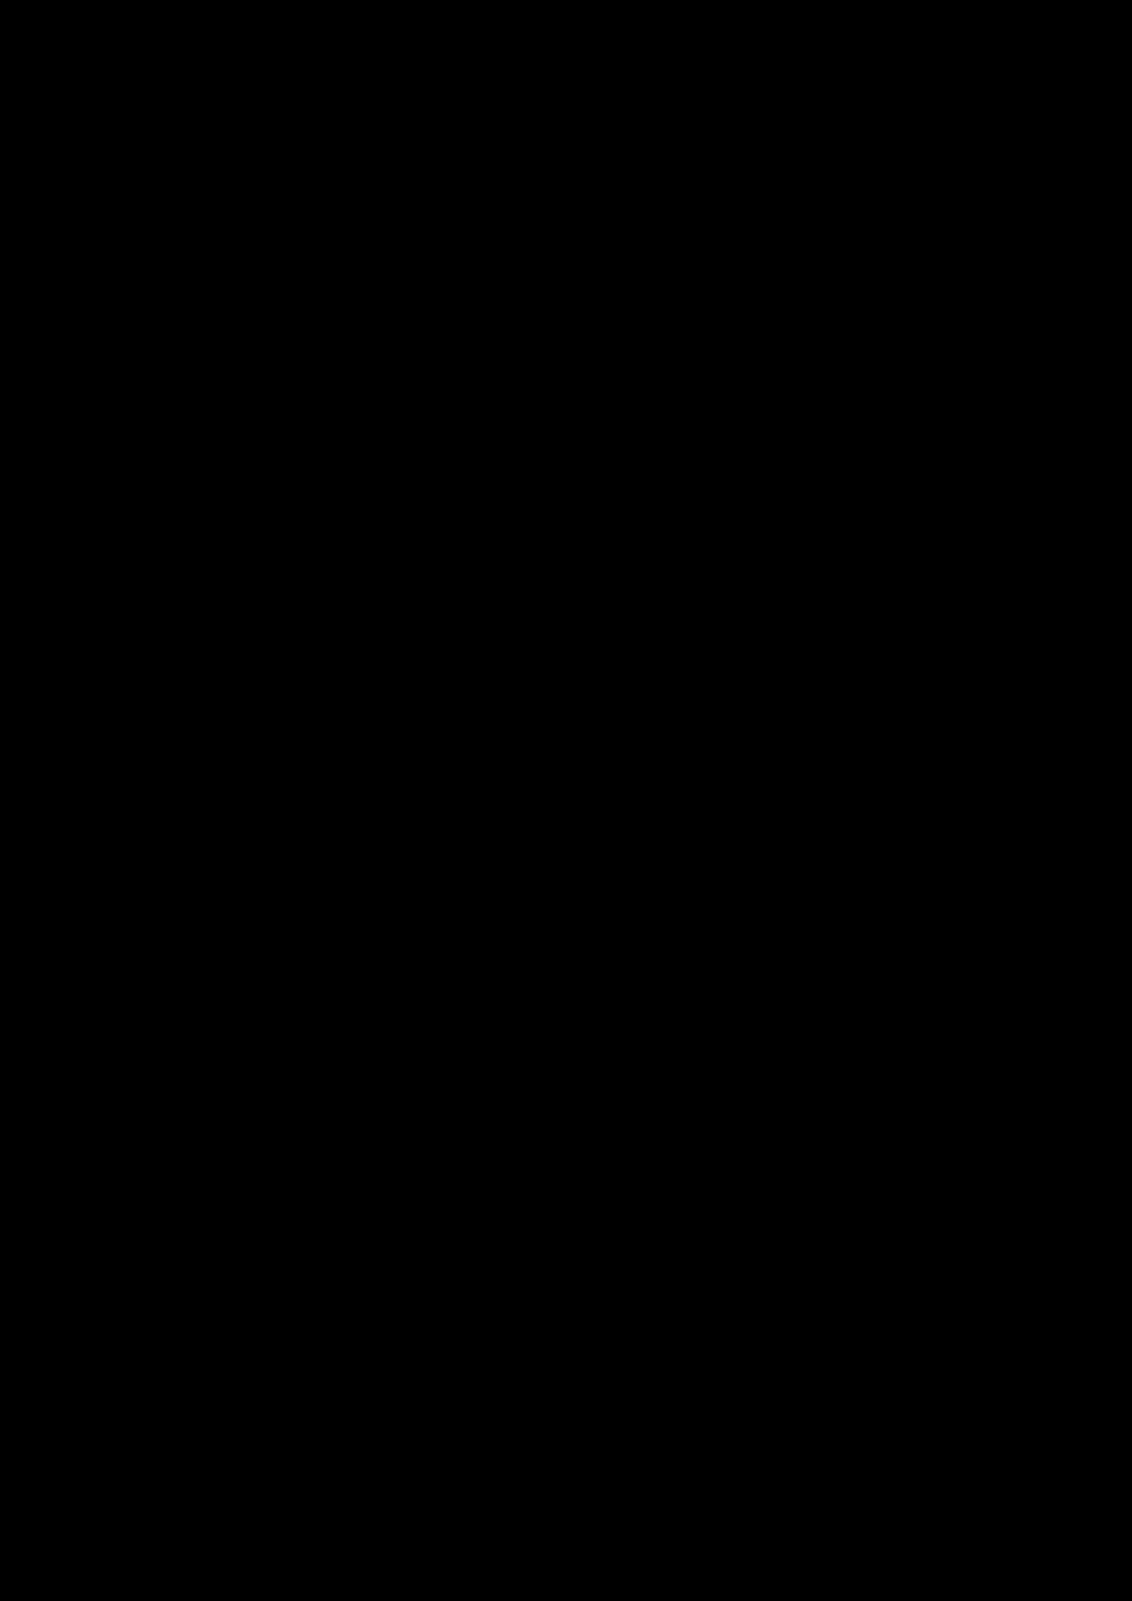 Ot Bolshogo Uma slide, Image 19